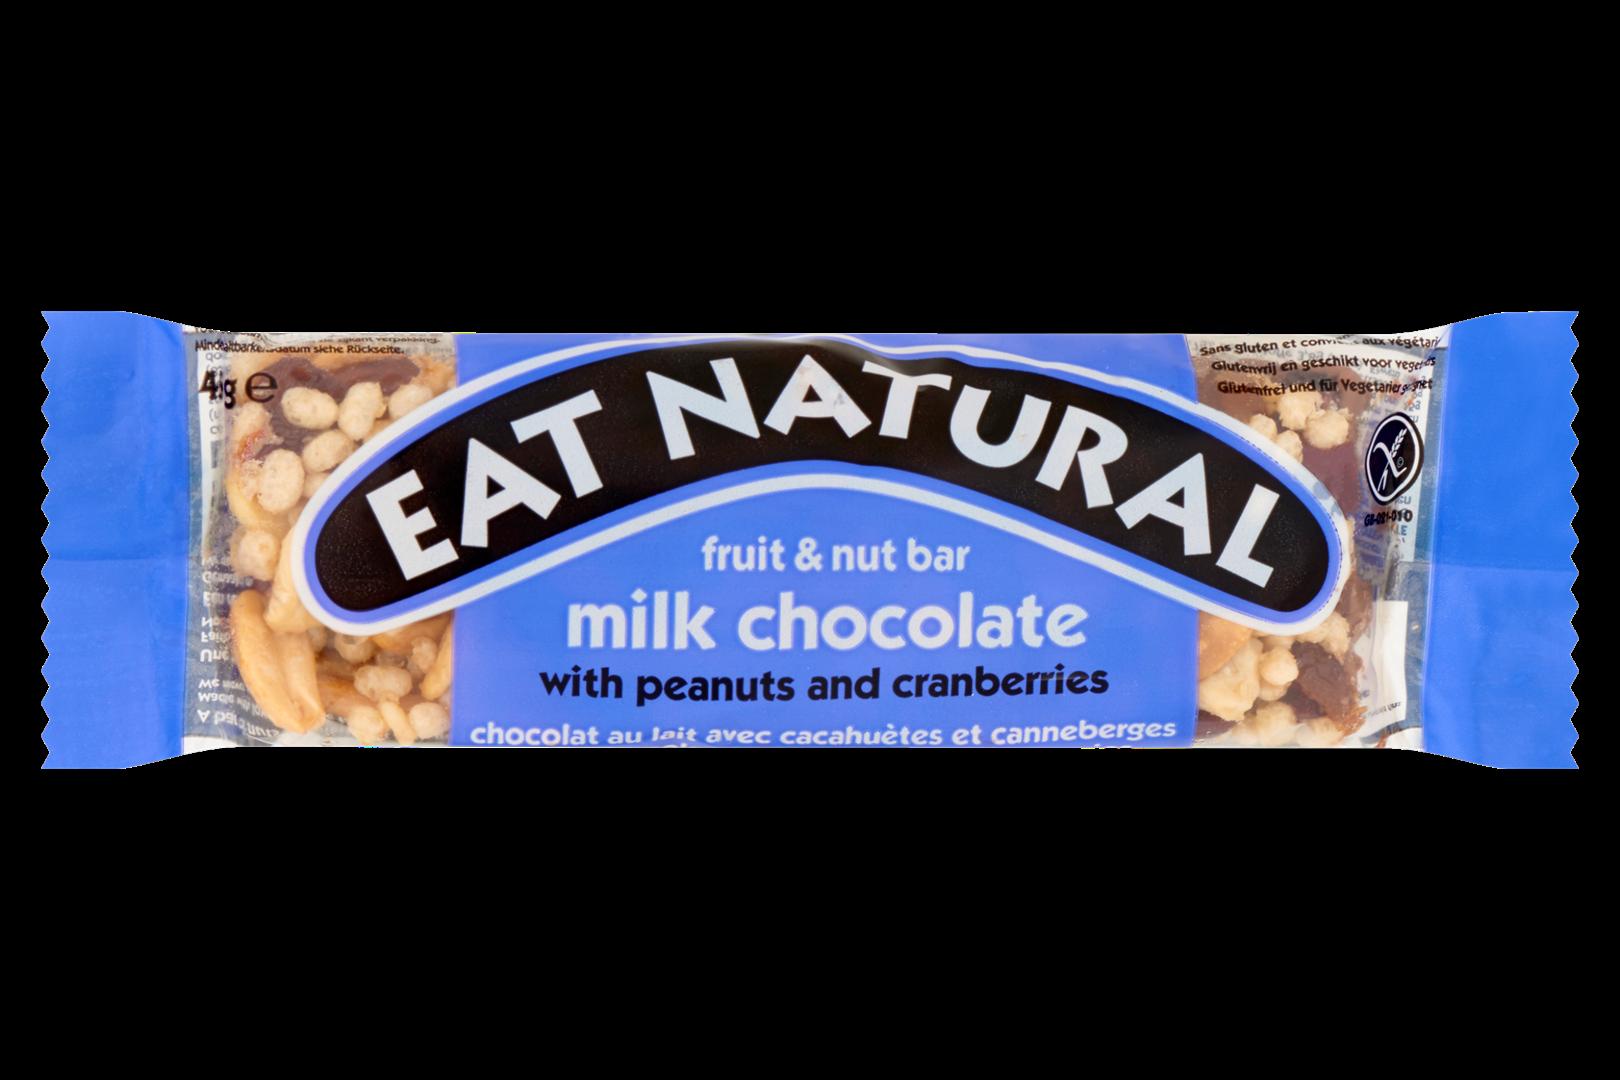 Productafbeelding Eat Natural fruit & nut bar melk chocolade met pinda's en cranberries 45 g